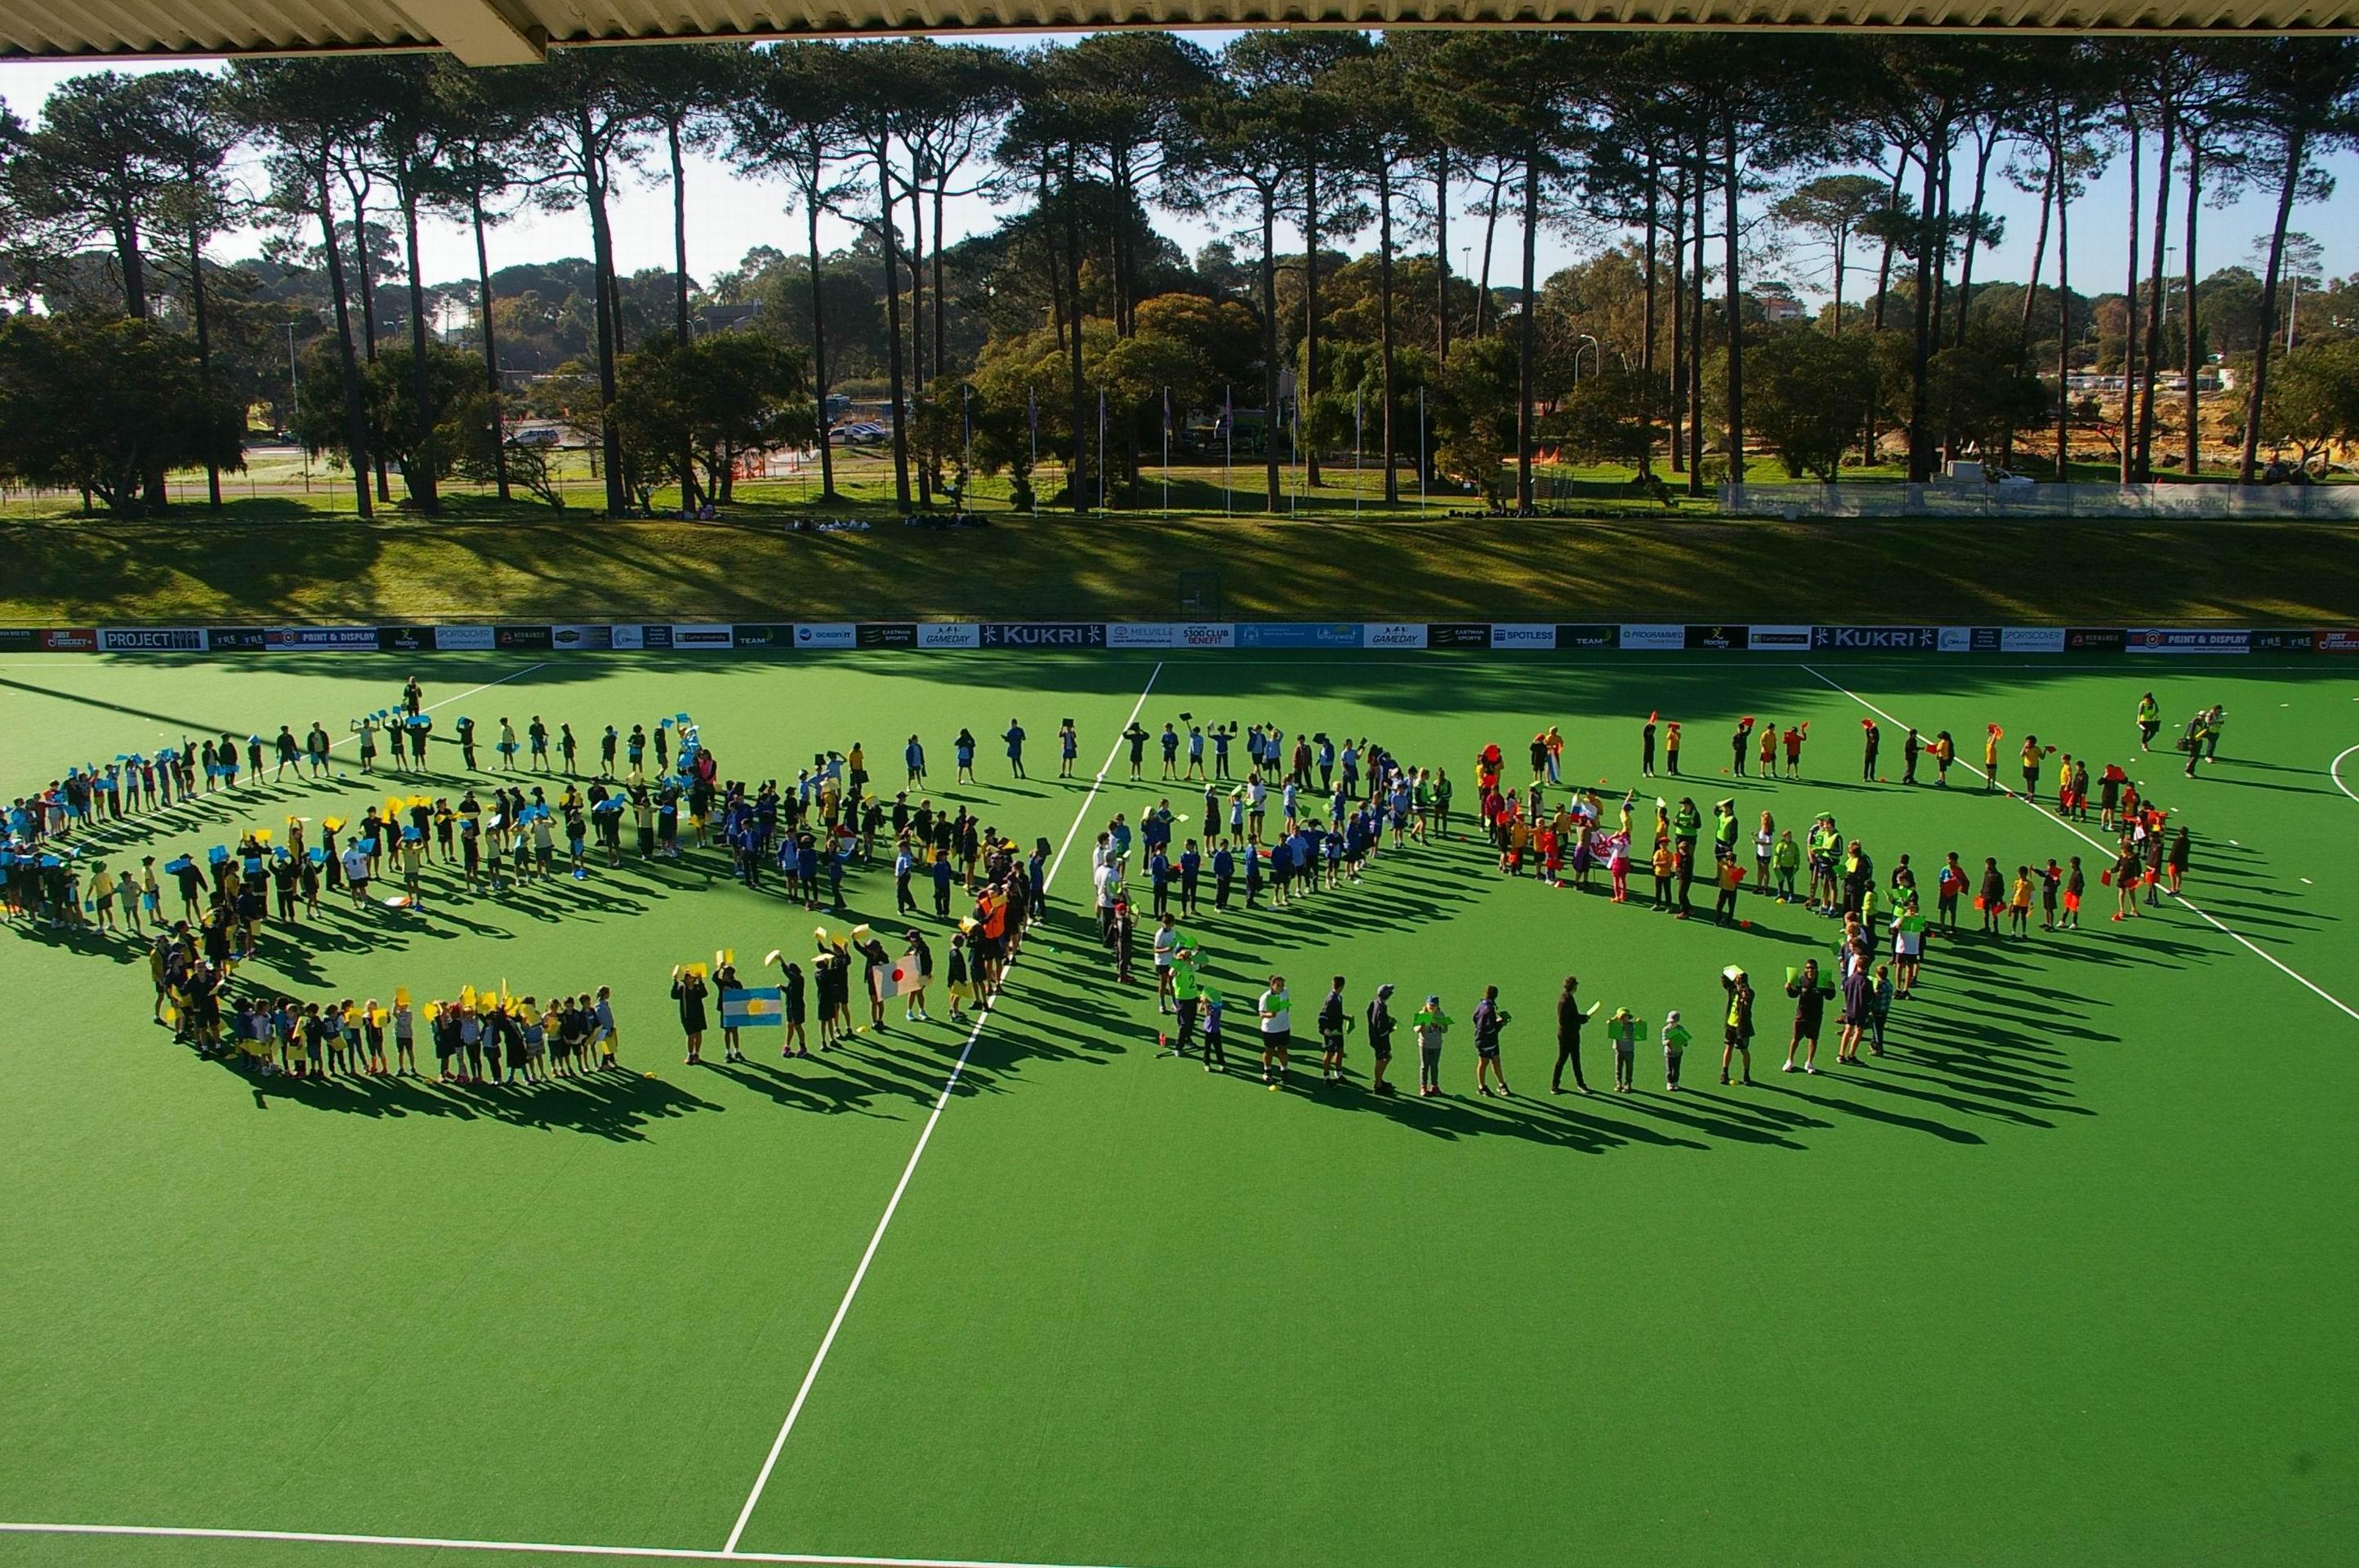 Perth school kids recreate Olympic opening ceremony